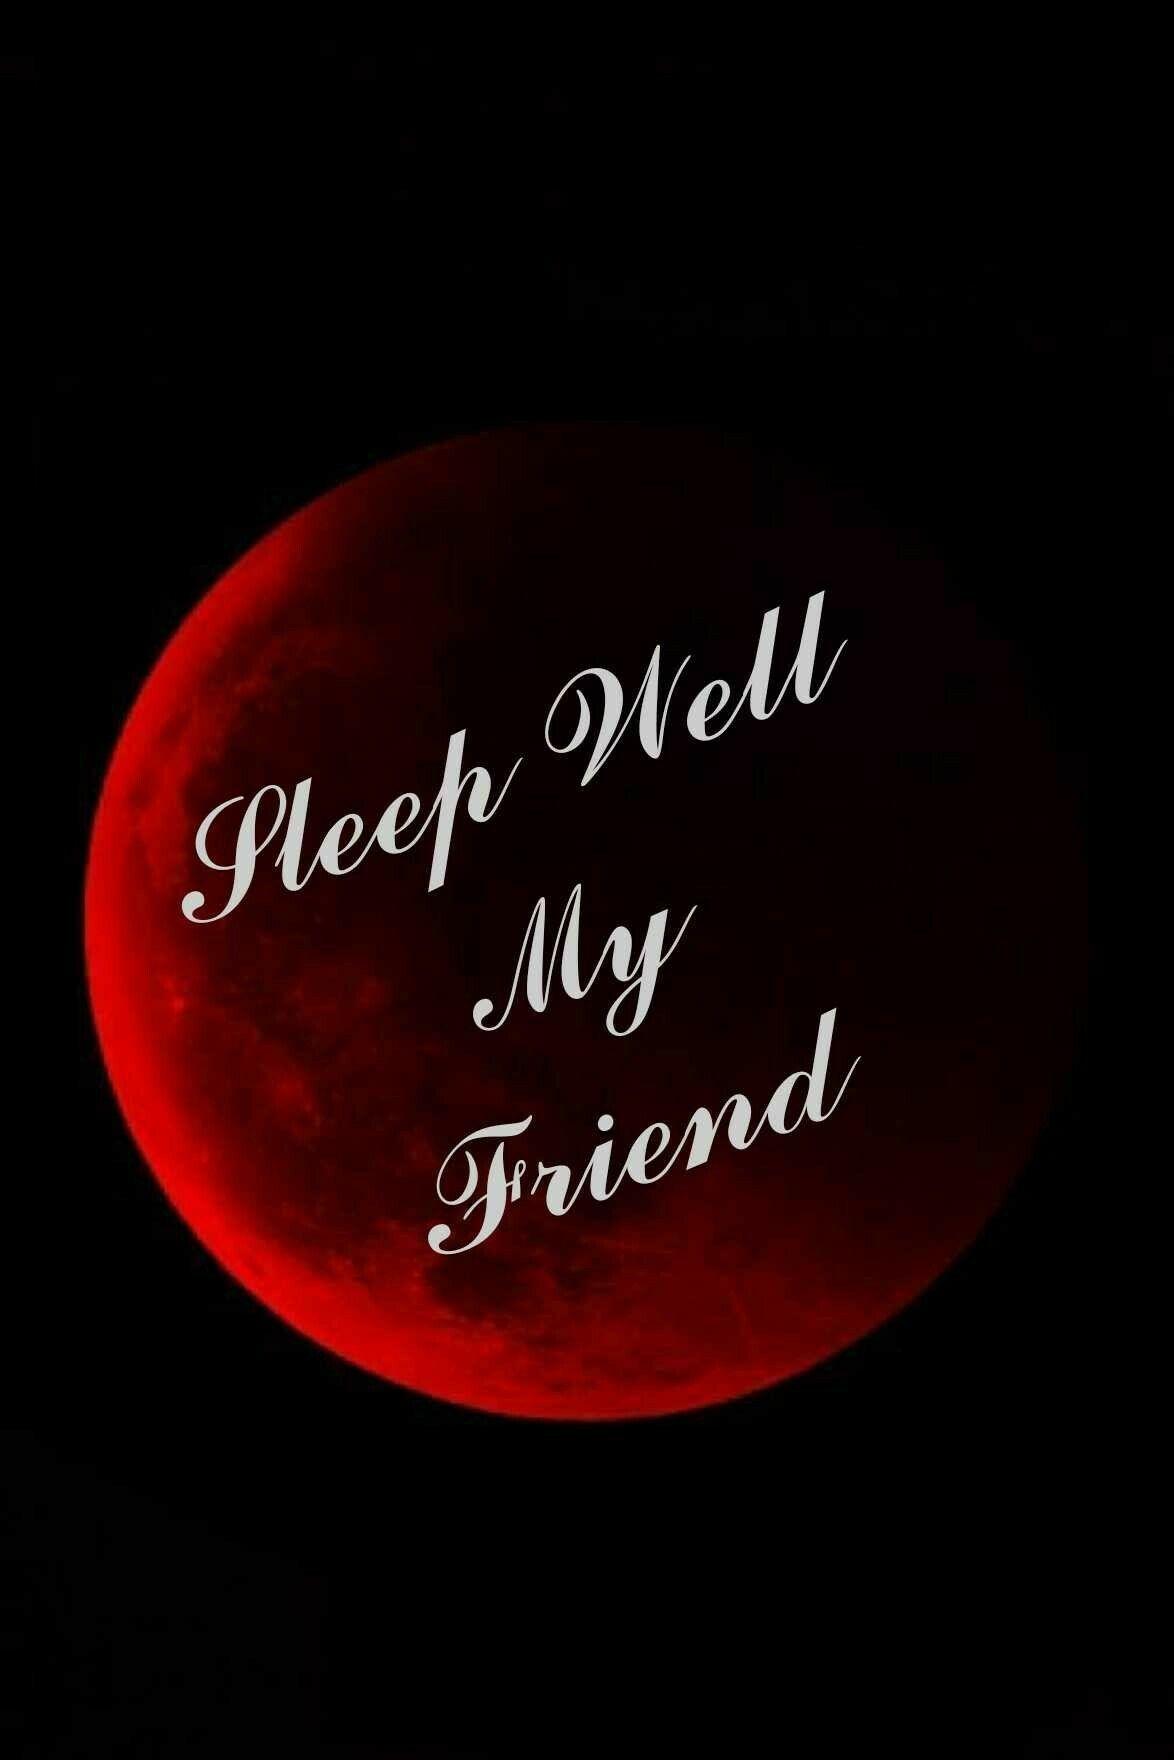 Sleep Well My Friends Sending Messages Good Night Good Night